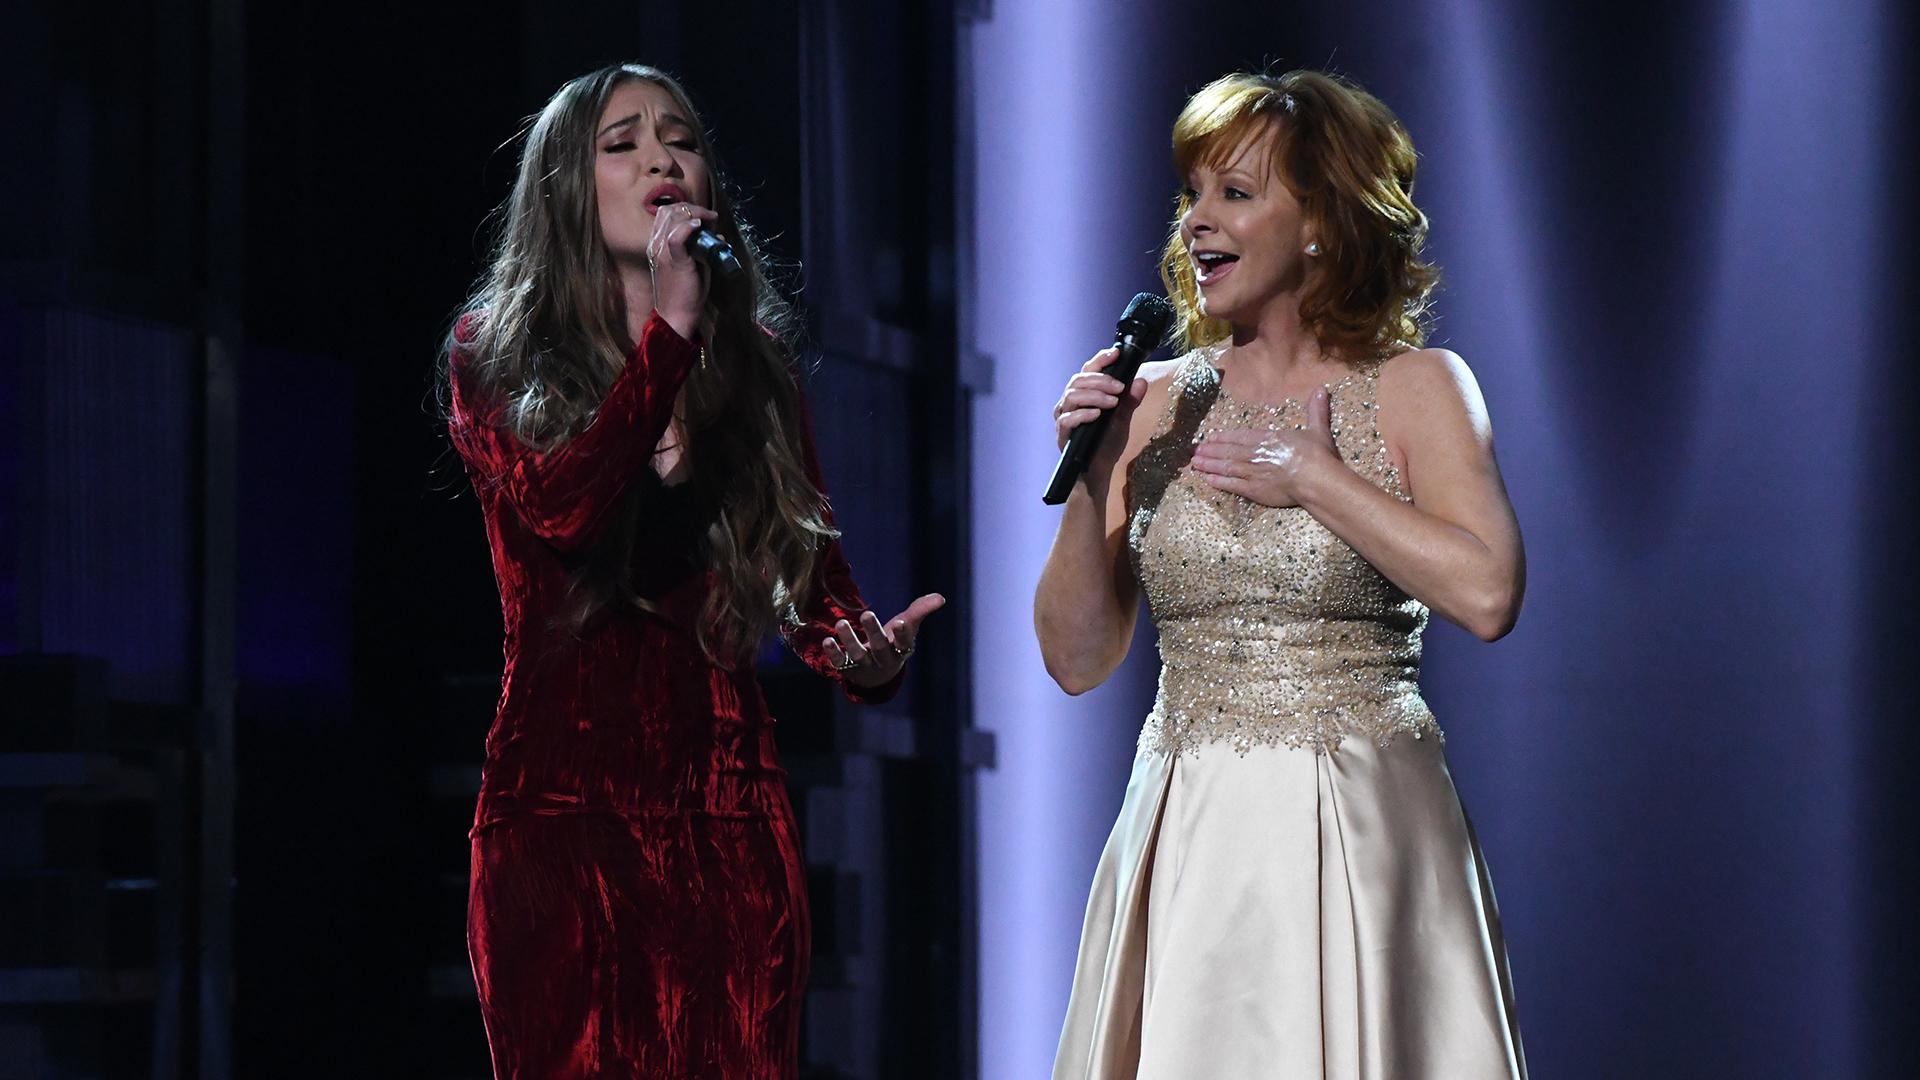 Reba McEntire and Lauren Daigle perform